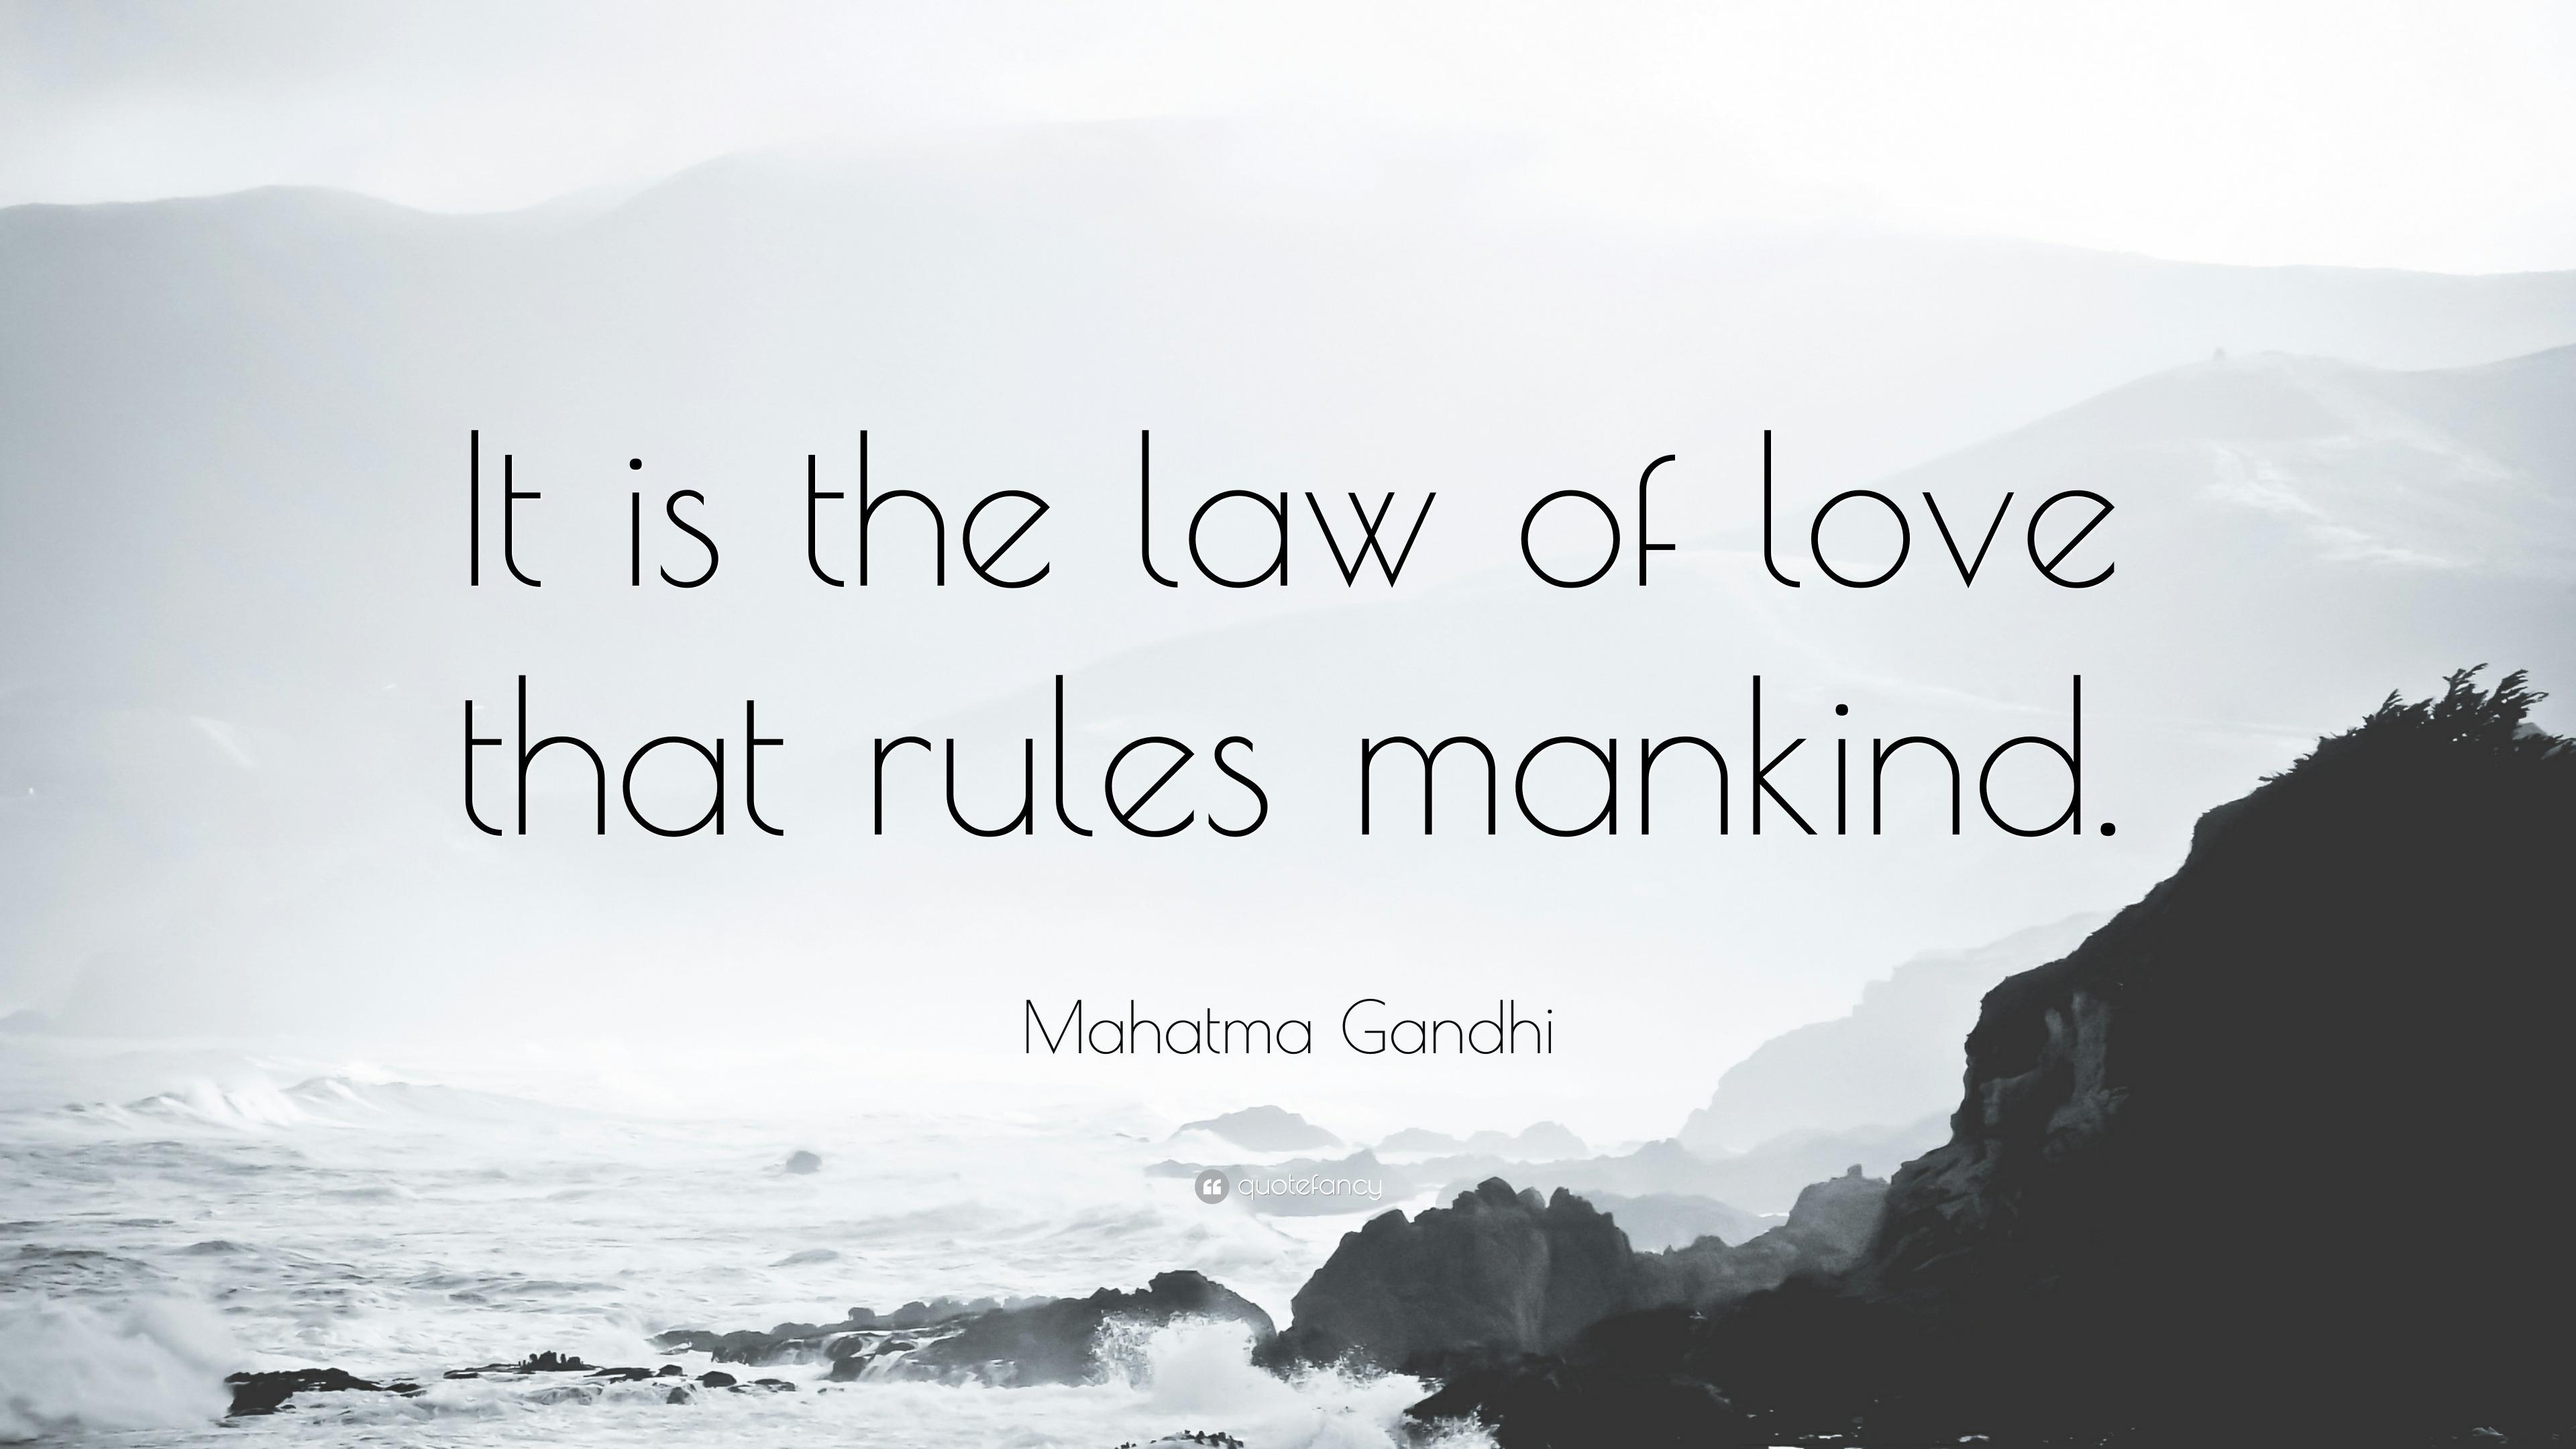 Mahatma Gandhi Quote: U201cIt Is The Law Of Love That Rules Mankind.u201d